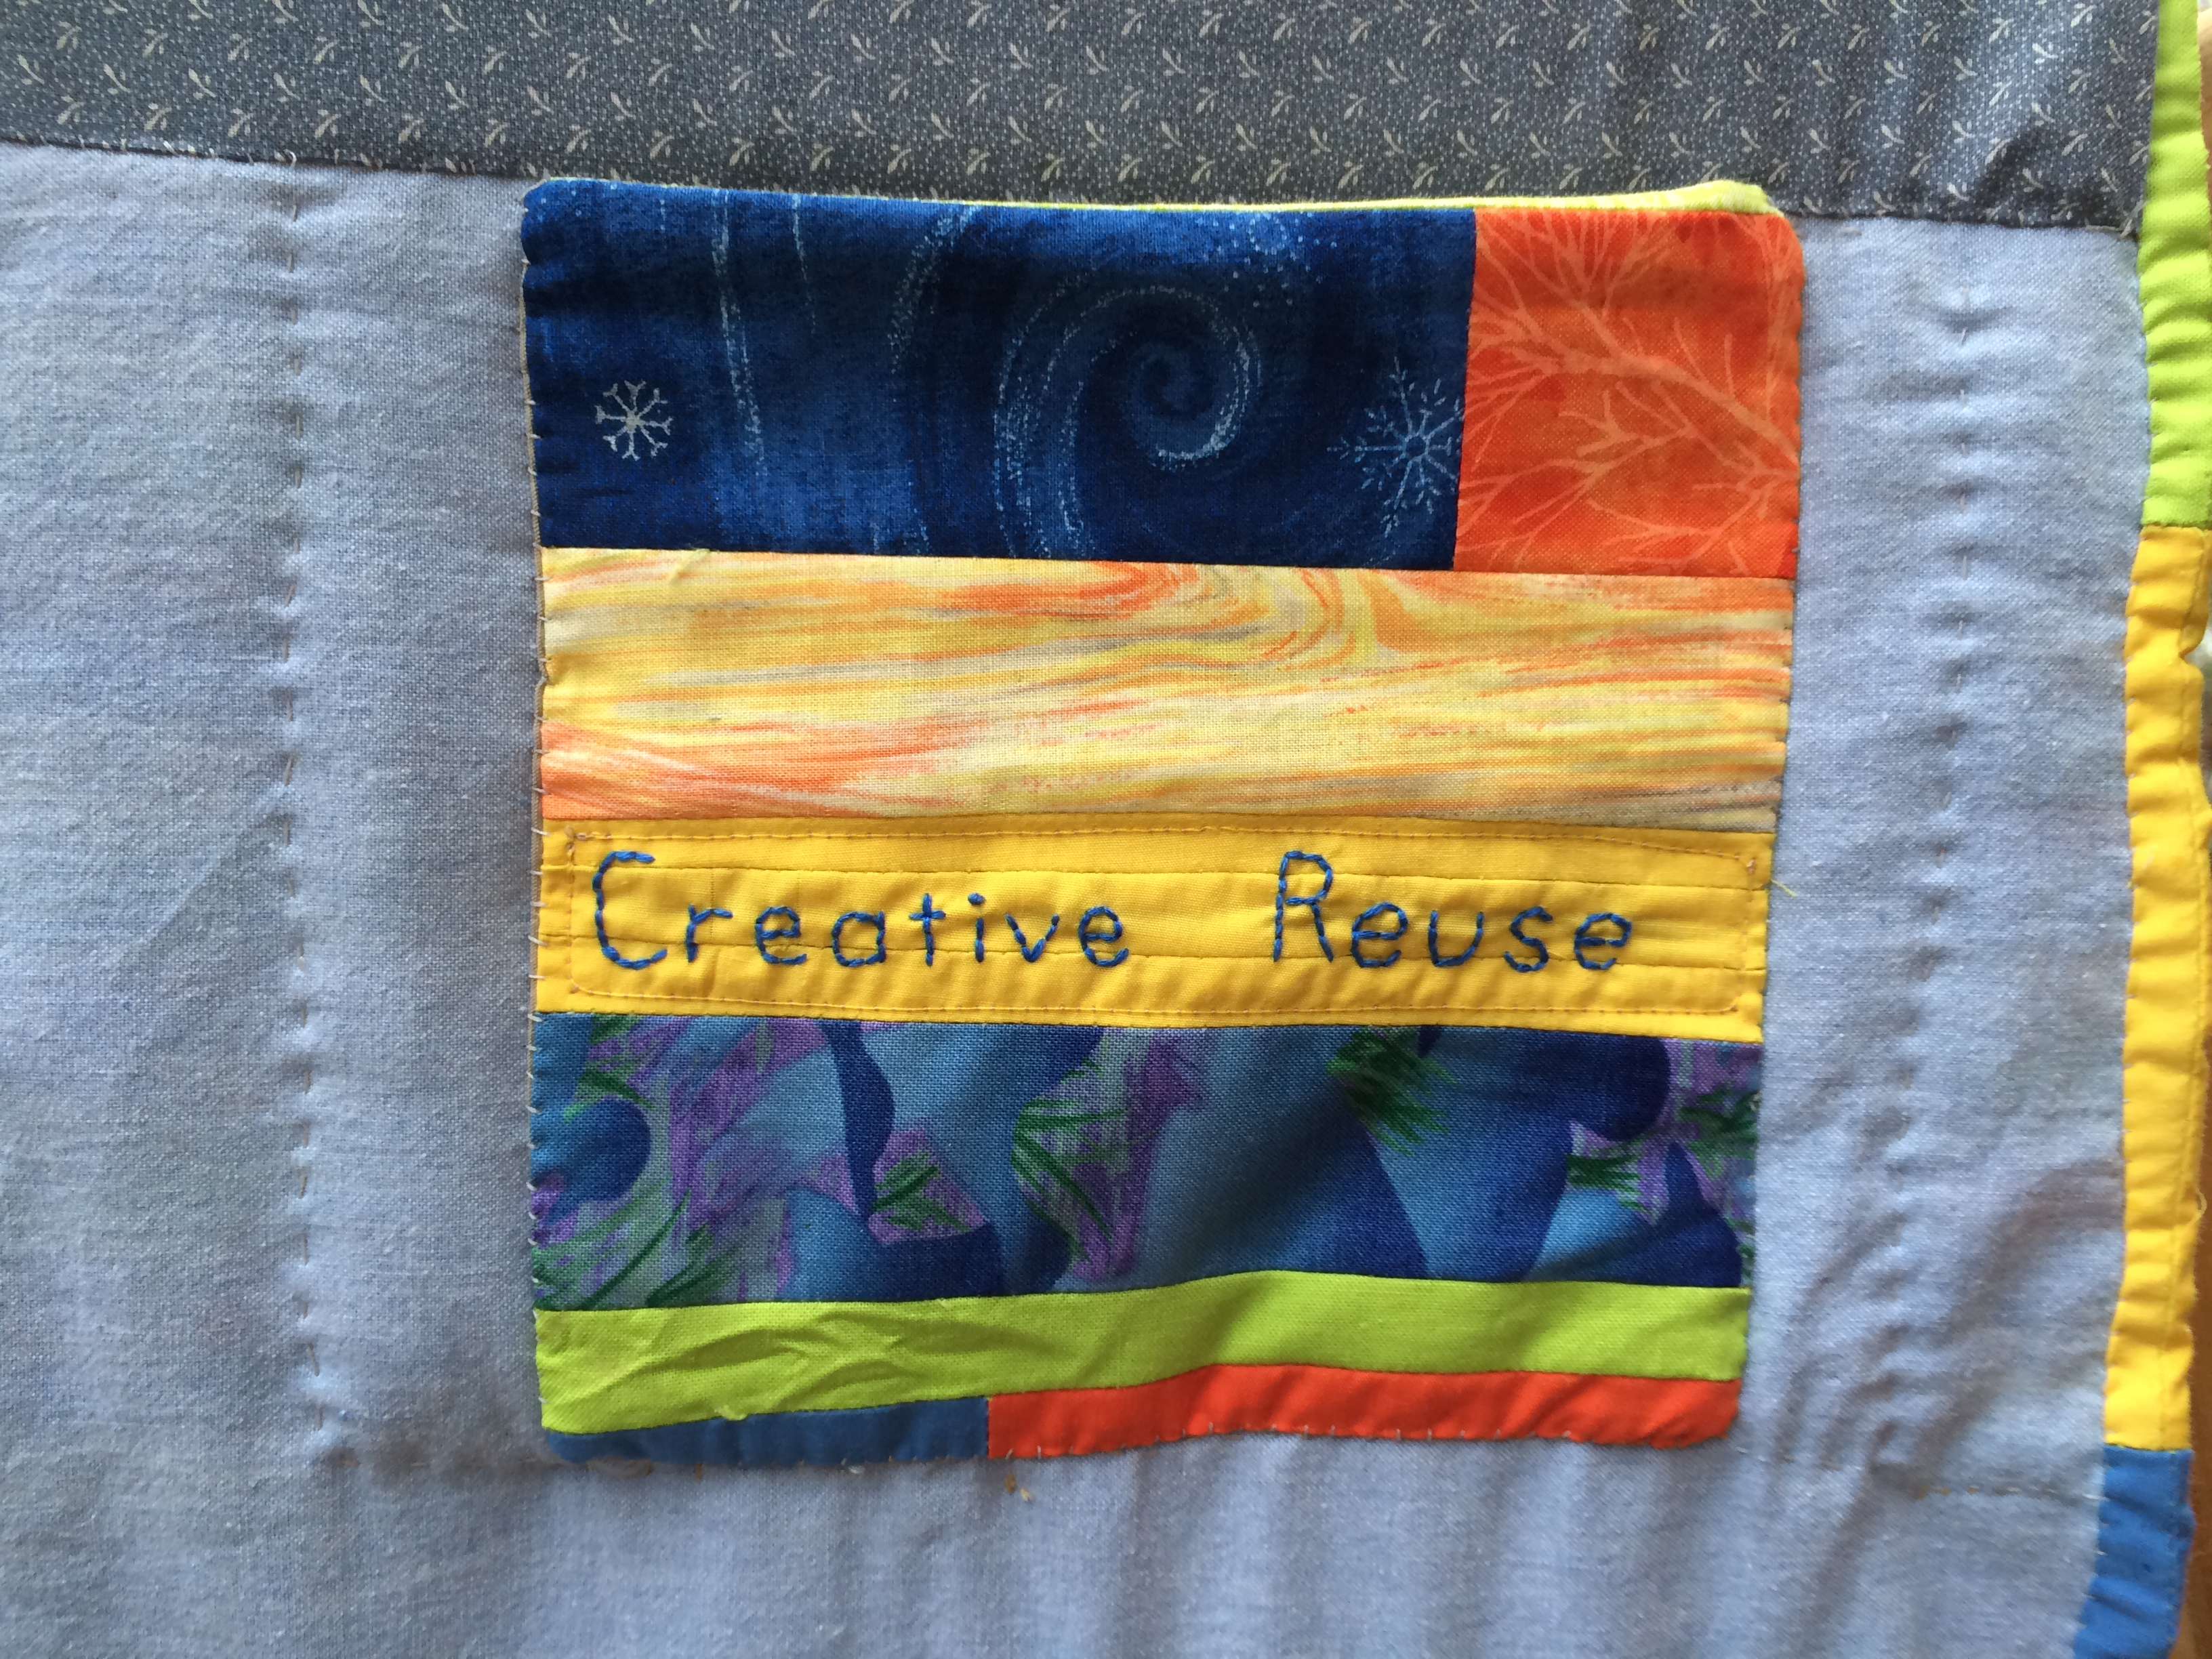 Creative Reuse Pocket on Golden Moments Weaving